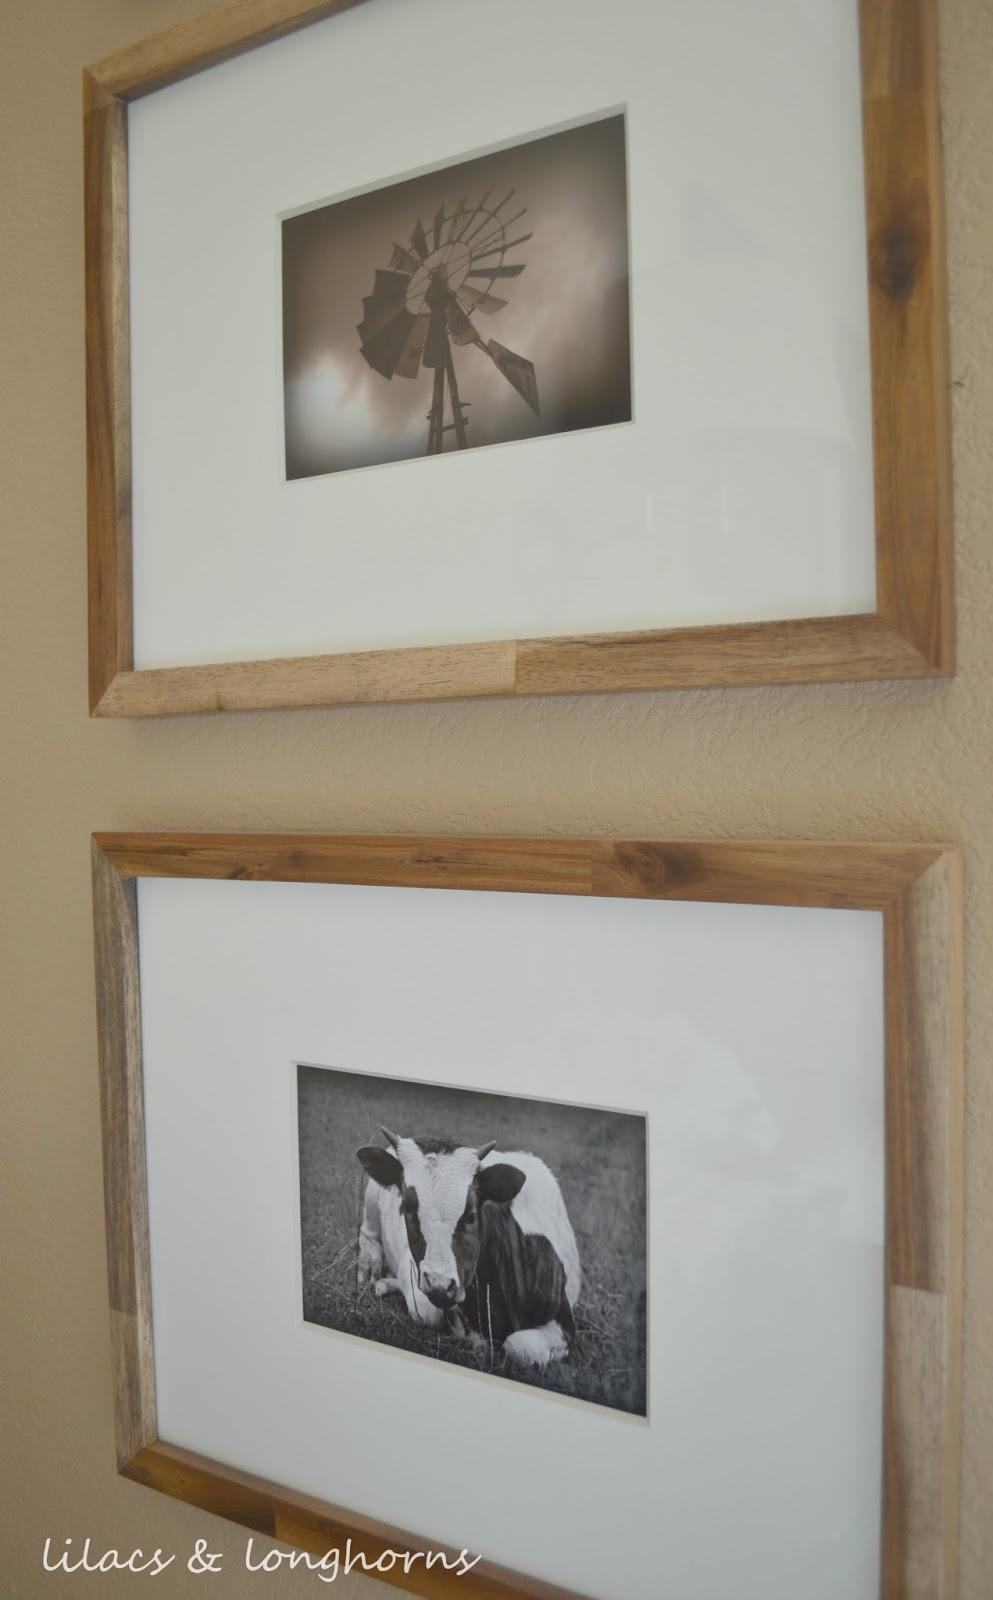 master bedroom update lilacs and longhornslilacs and longhorns